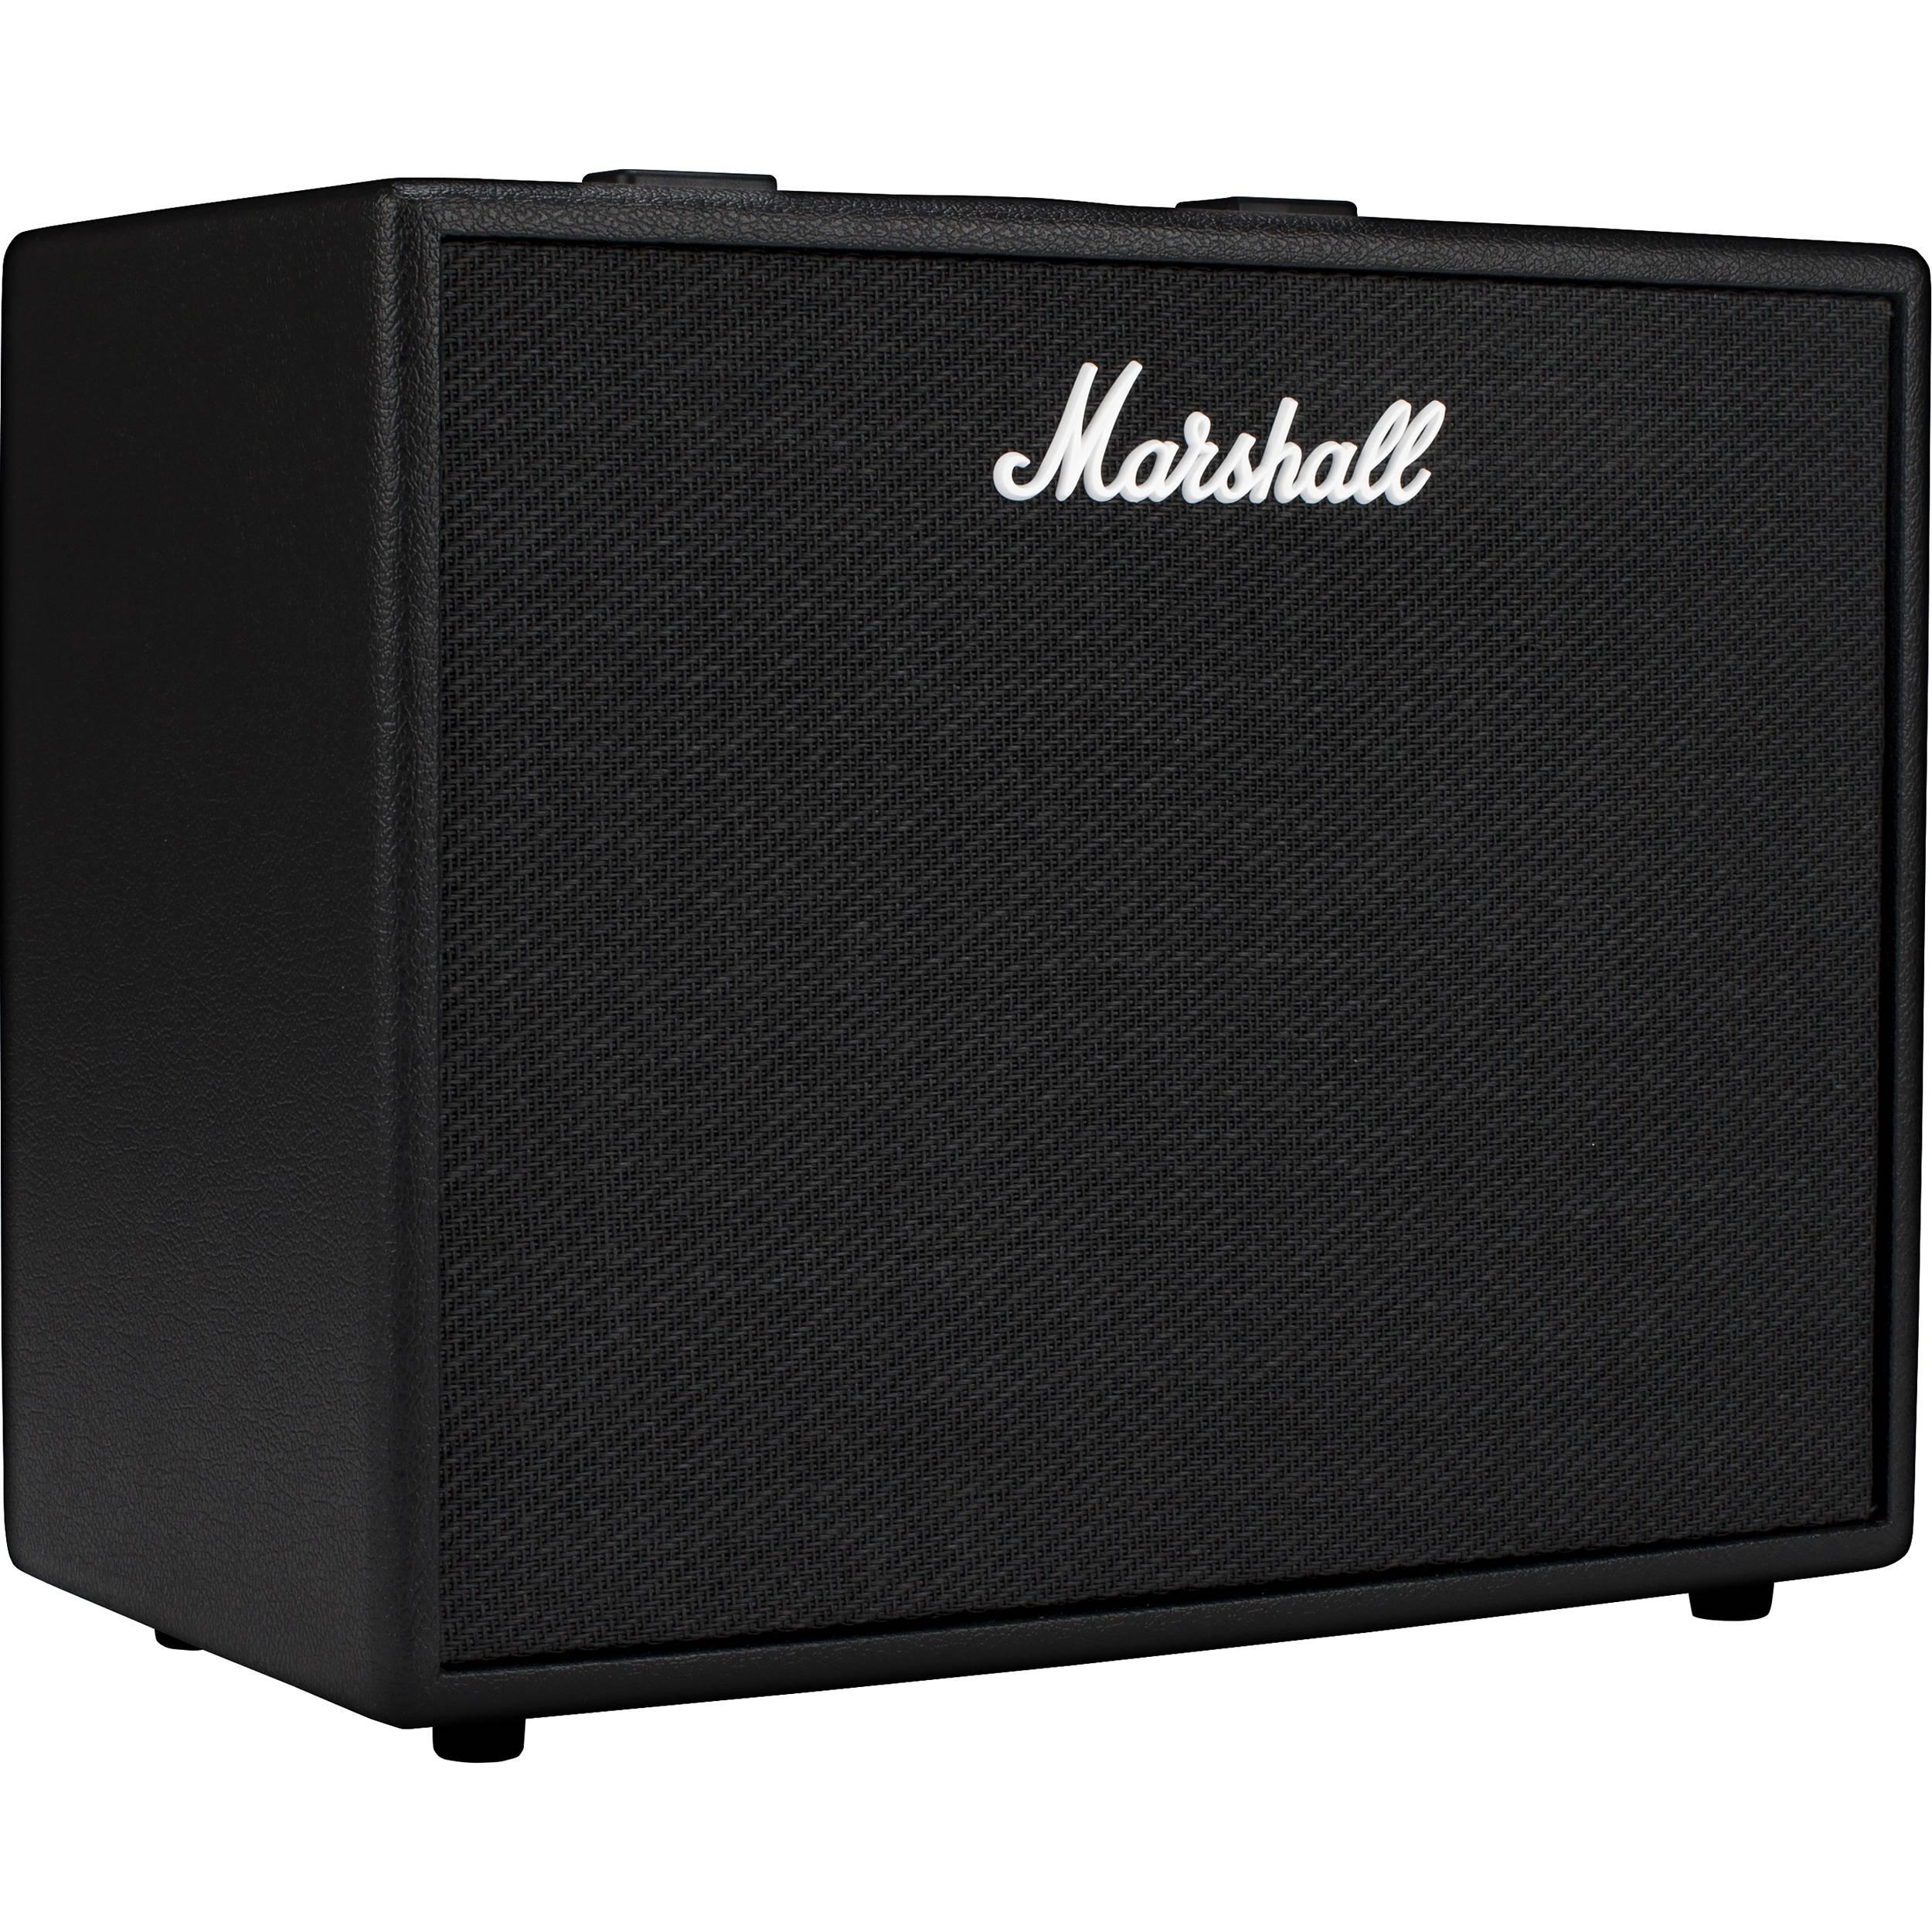 marshall amplification marshall code50 50w 1x12 m code50 u. Black Bedroom Furniture Sets. Home Design Ideas